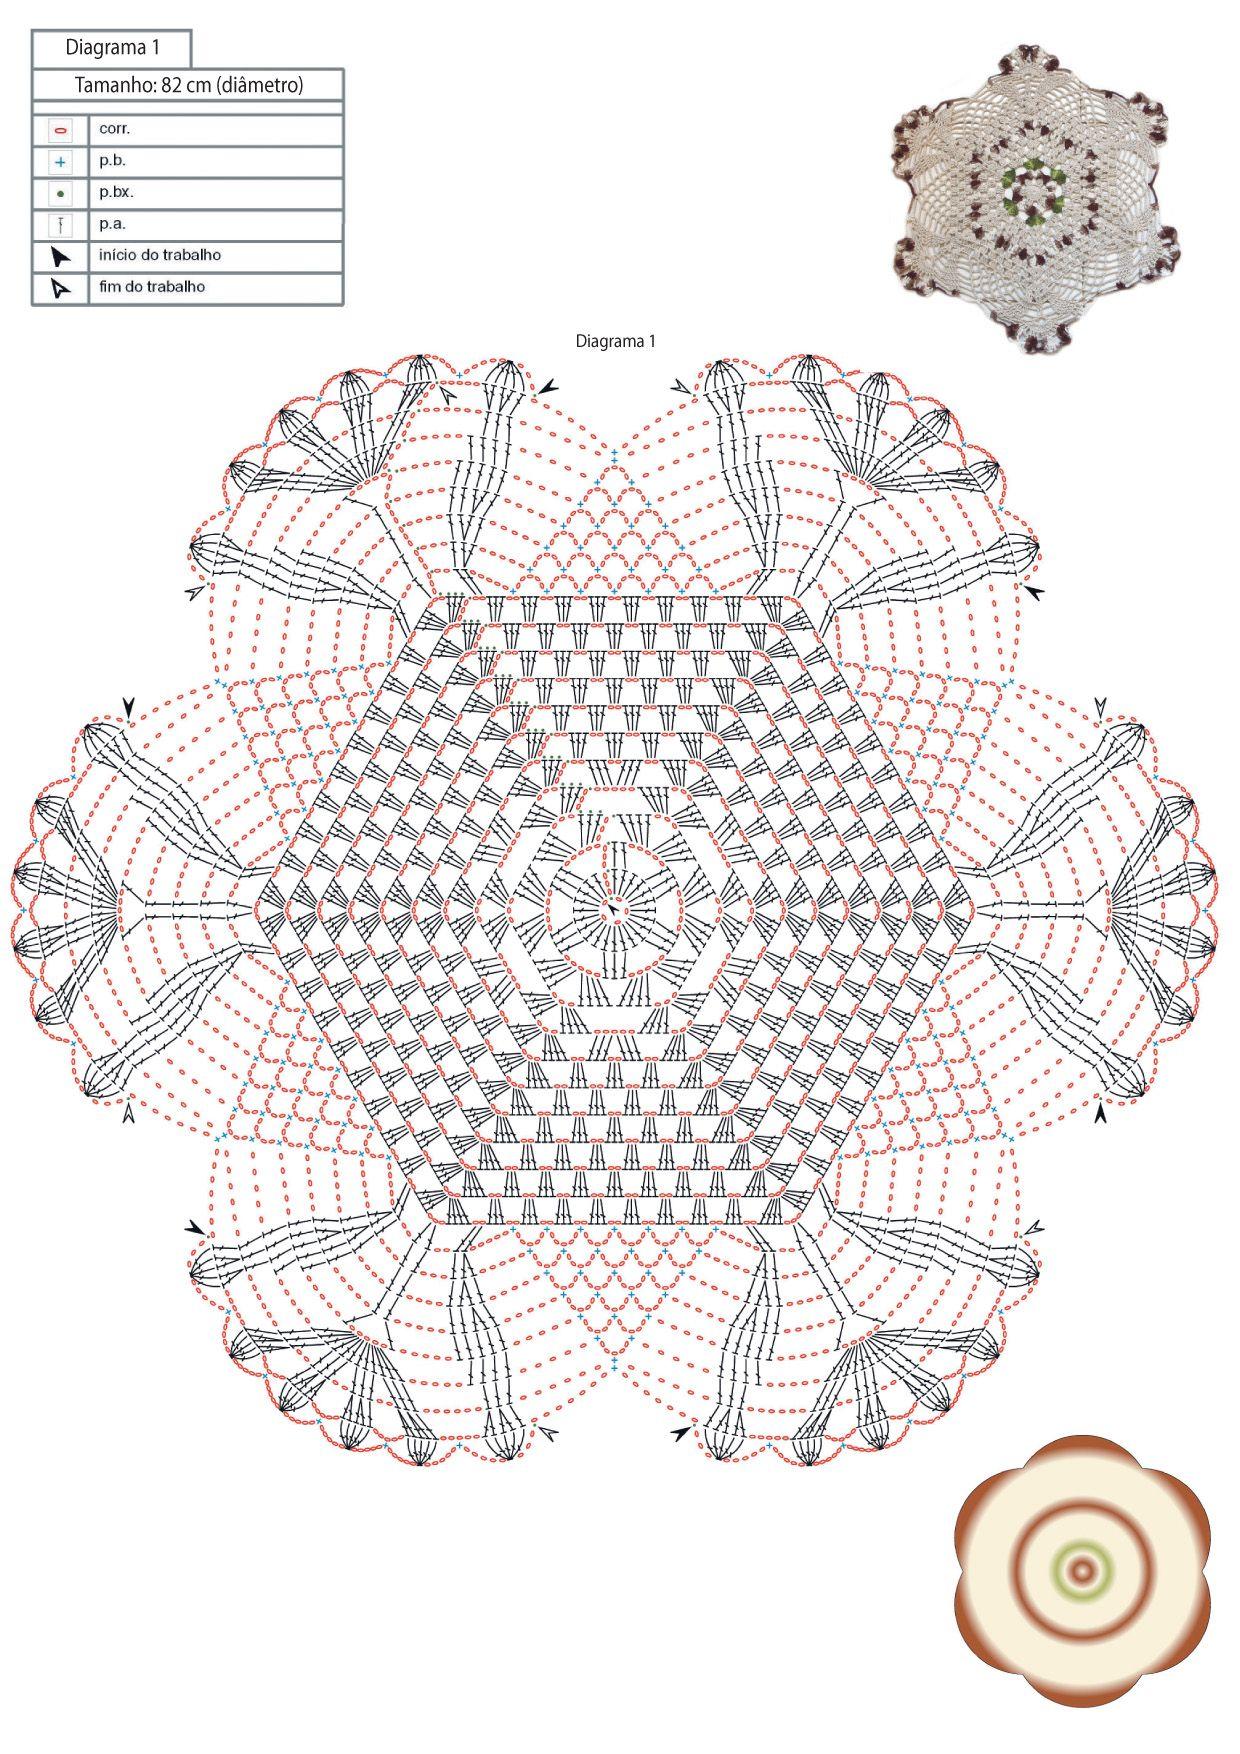 gráfico-tapete-de-crochê-com-flores.jpg (1240×1754) | Doily Patterns ...